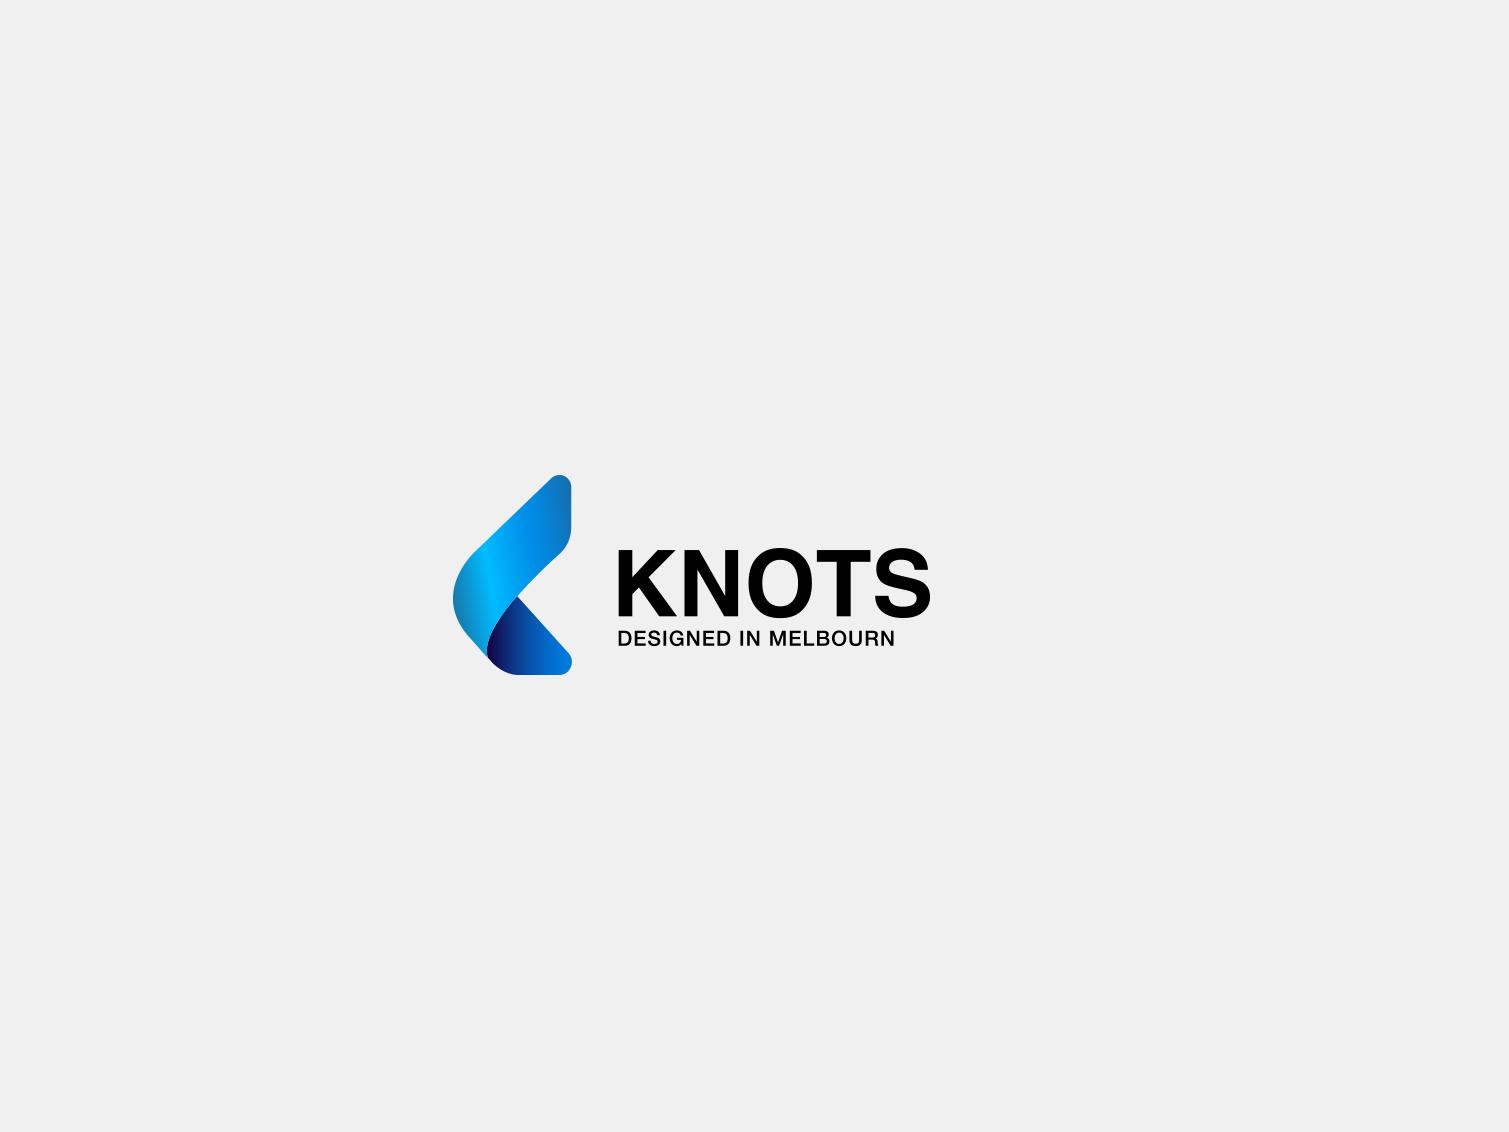 knots logo wonderful k logo modern shoes fashion brand card icon branding vector logo brand illistration design